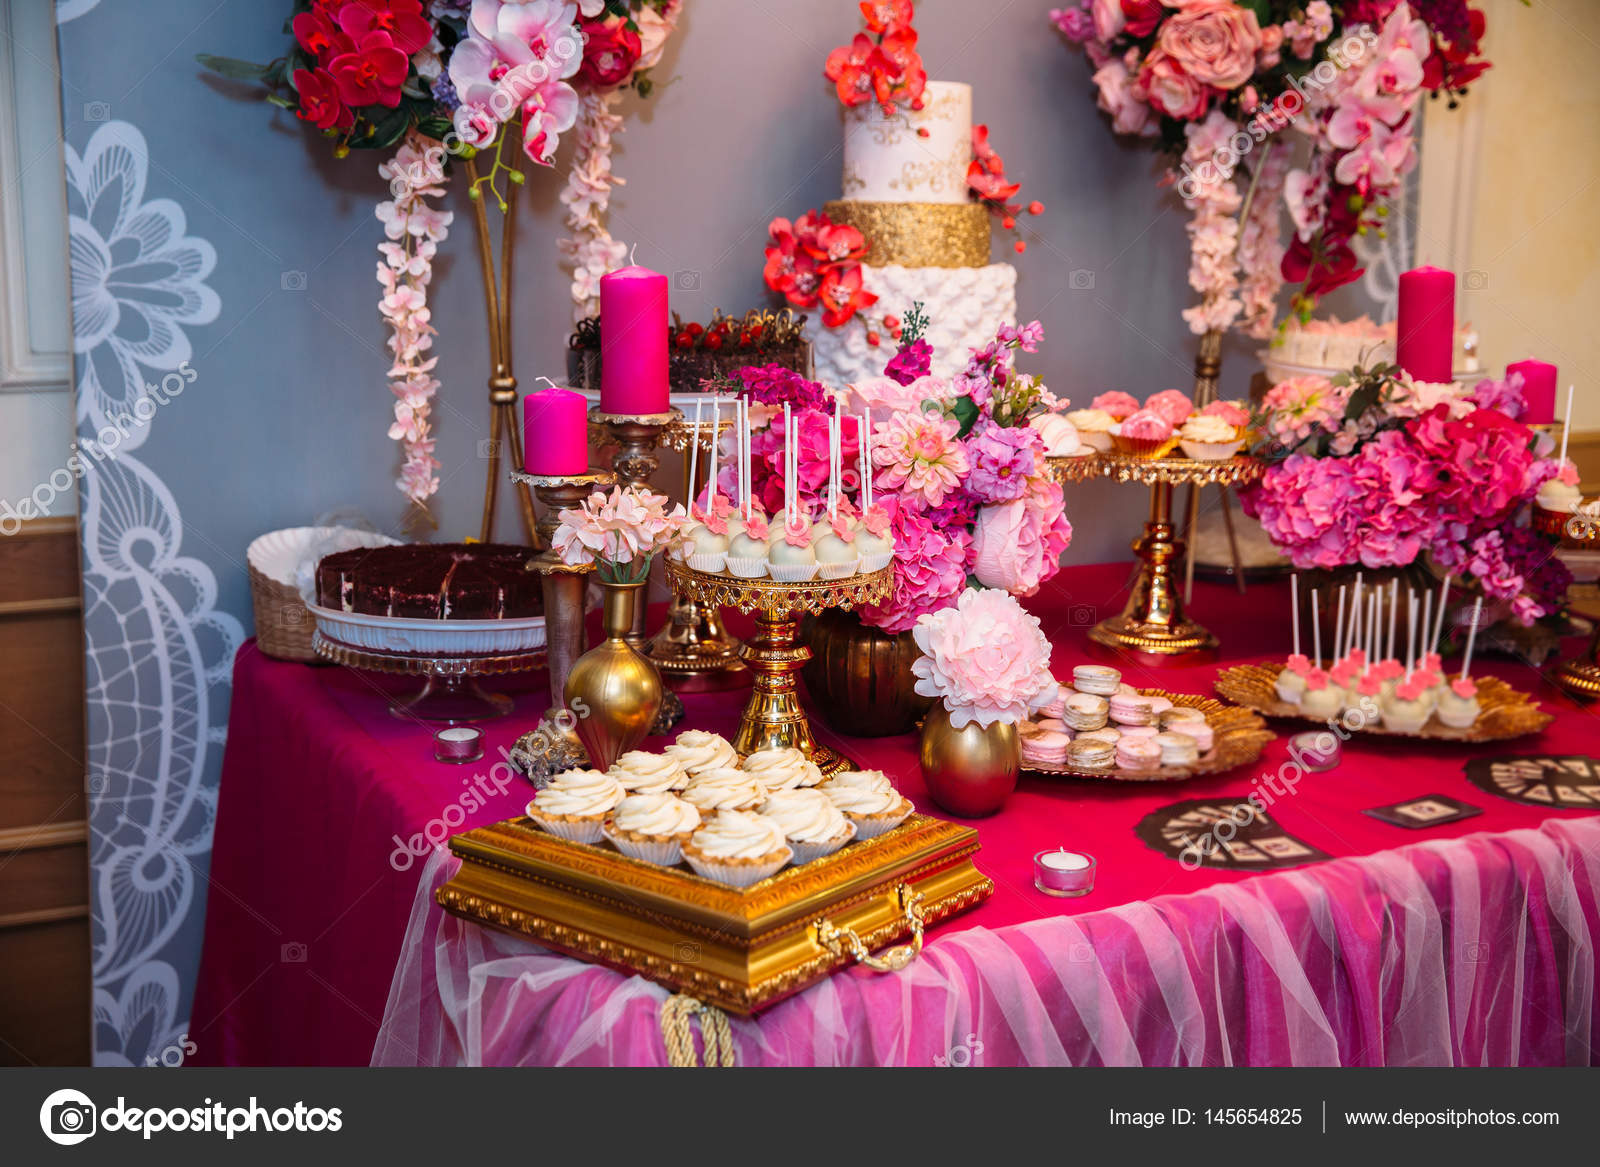 Sweet multilevel wedding cake decorated with beautiful flowers ...